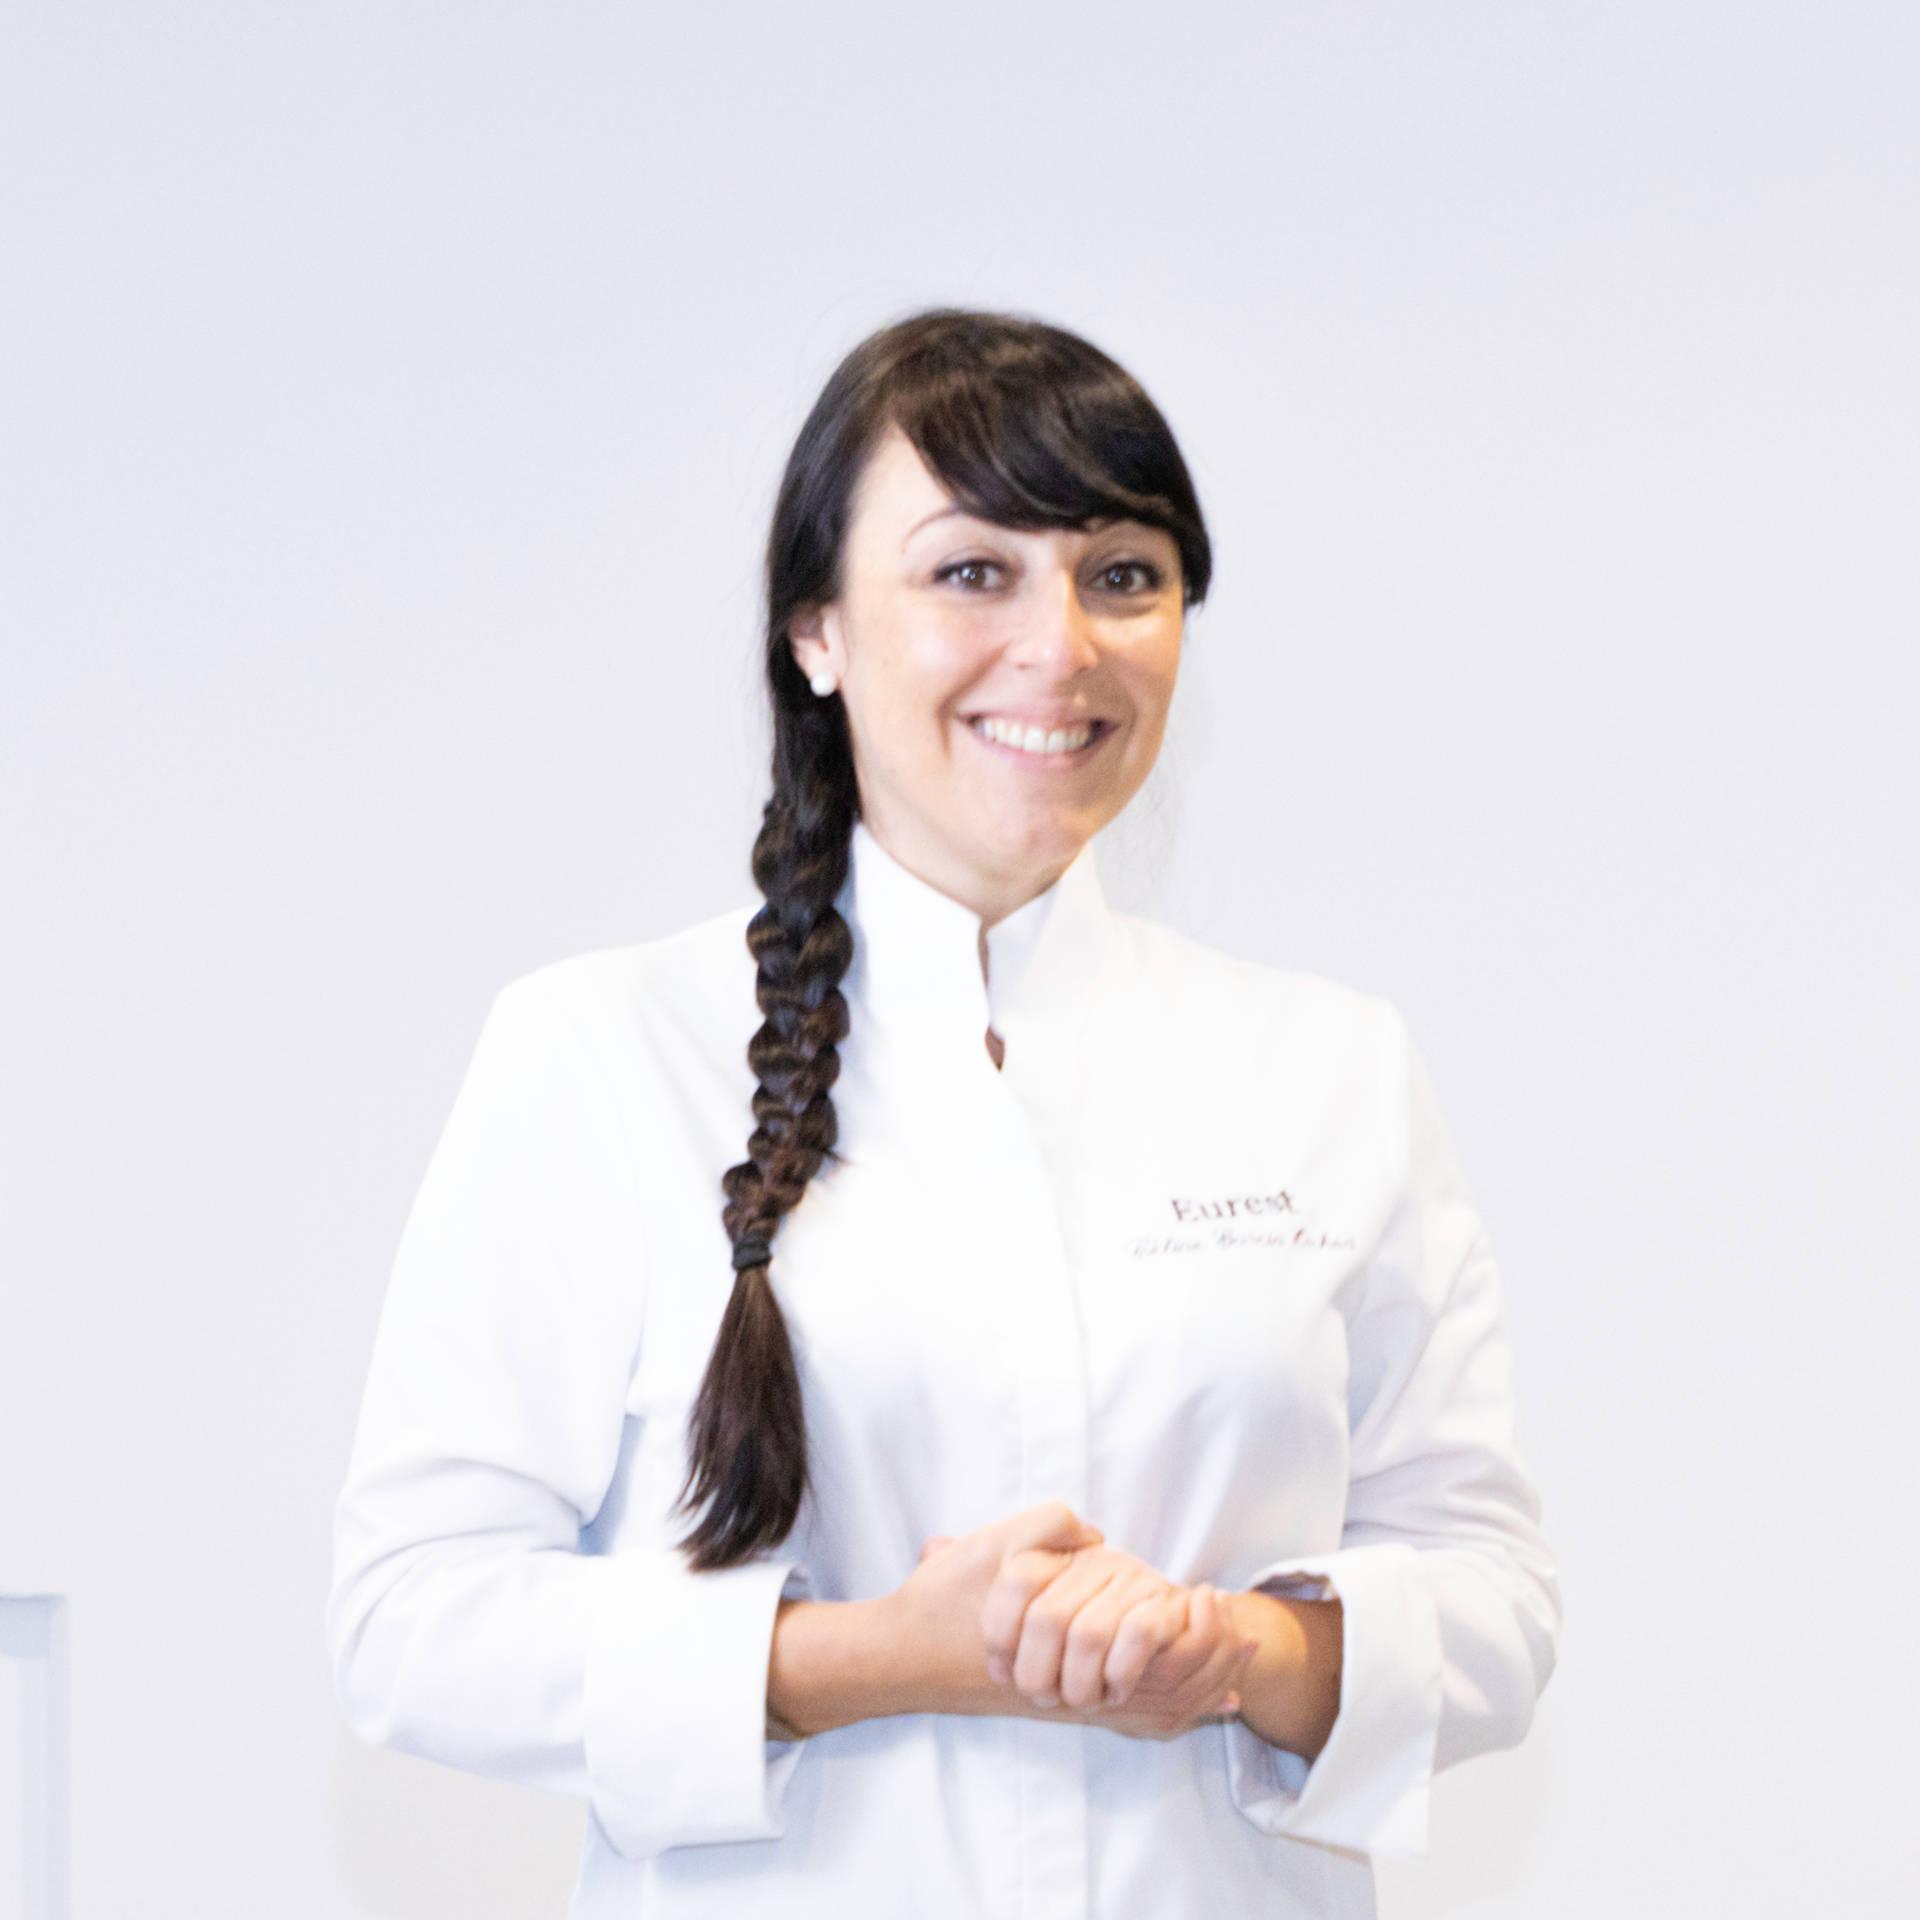 Céline Garcia Ochoa